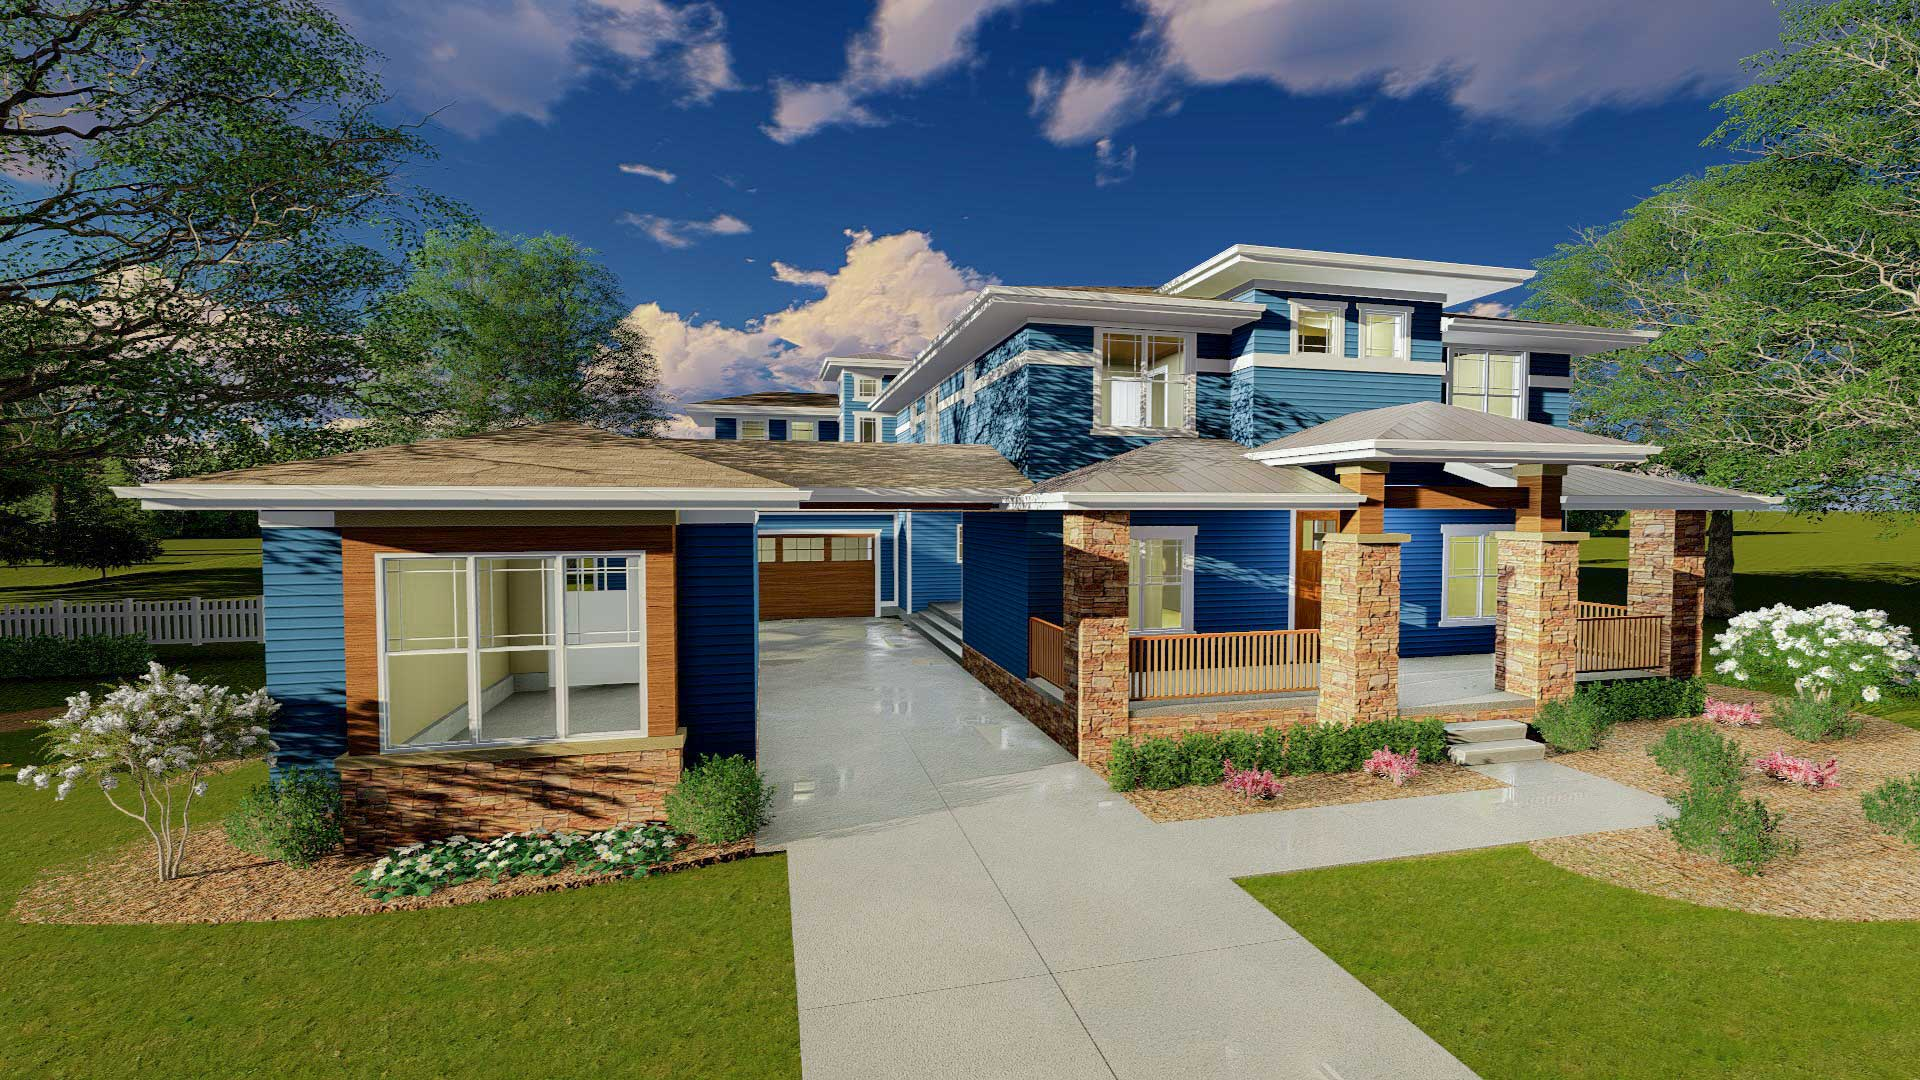 Prairie style house plan with porte cochere 62561dj for Prairie house plan